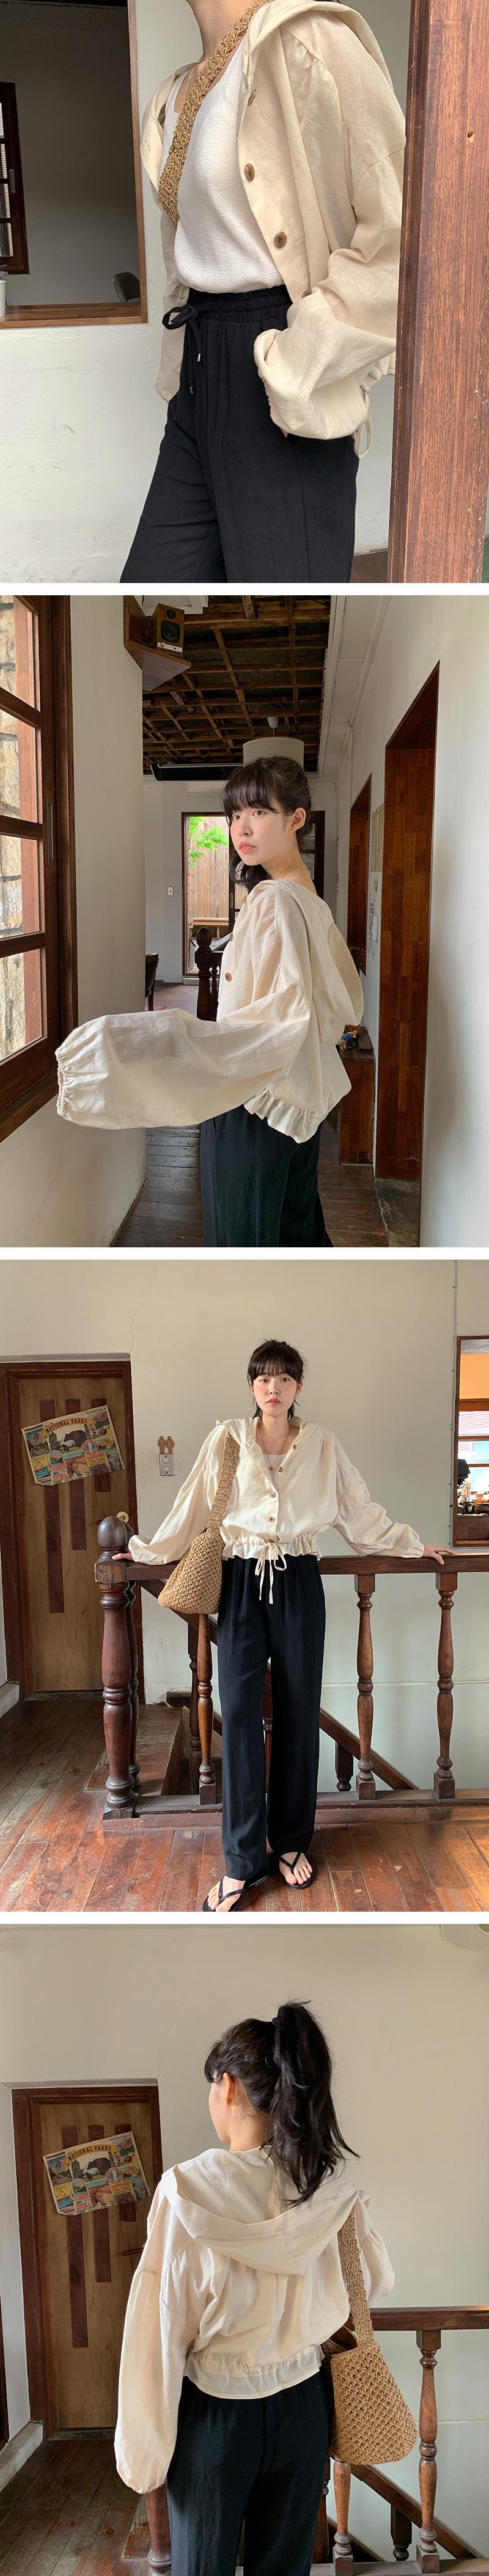 Linen string hooded shirt